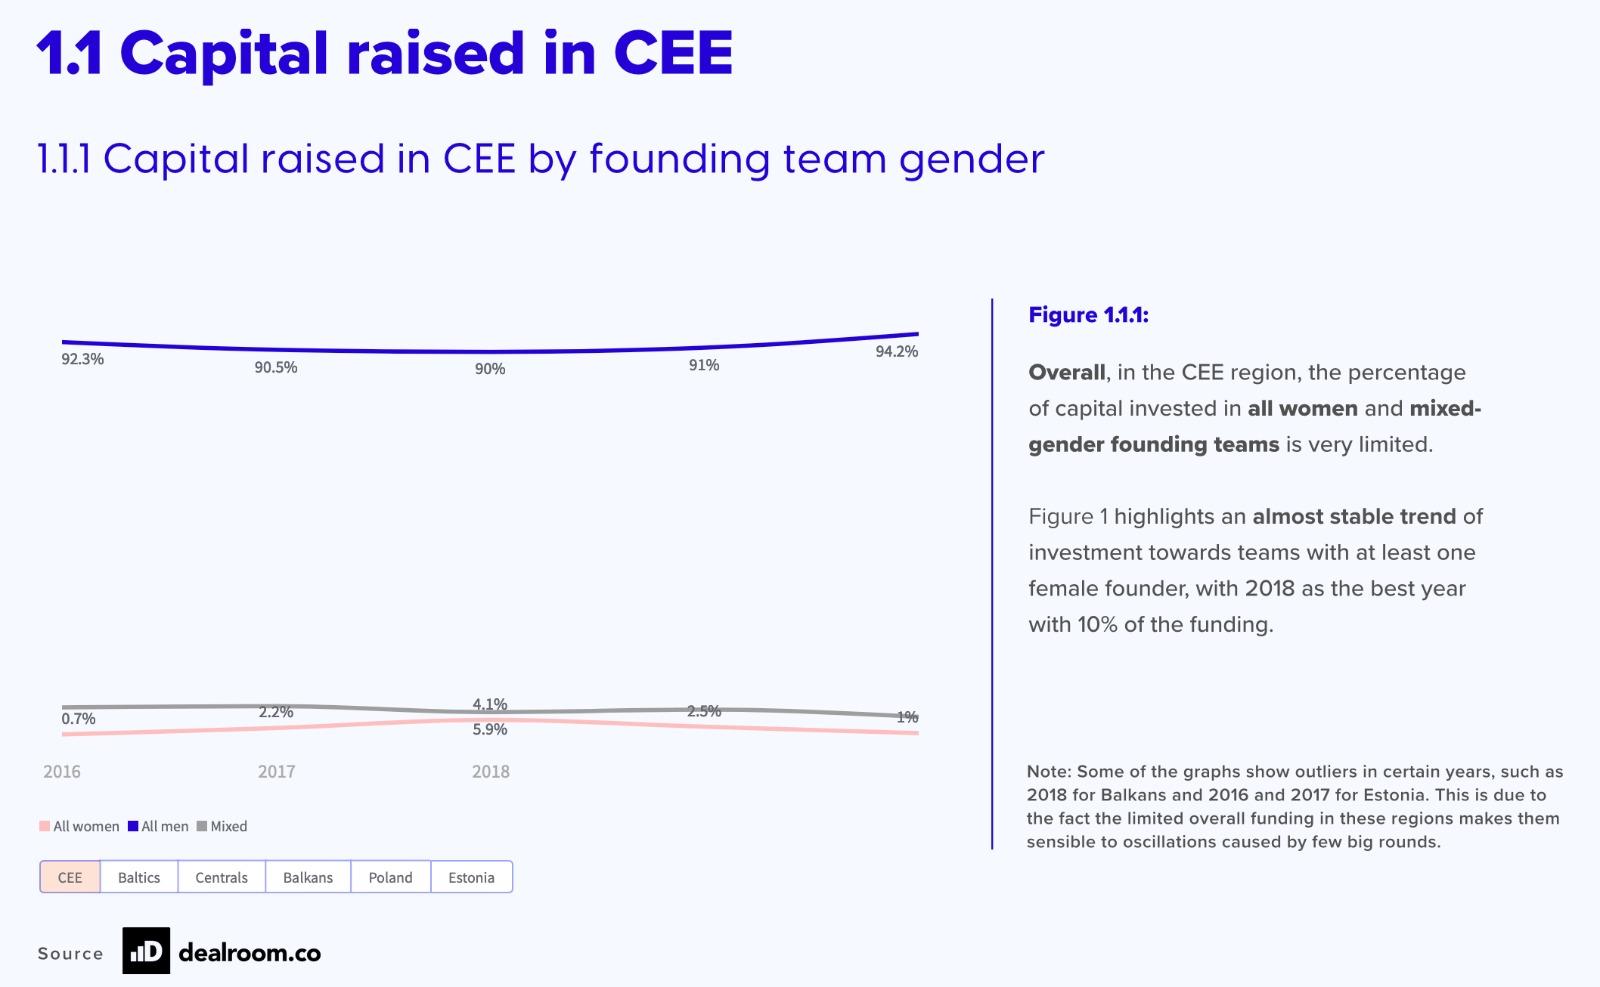 Capital raised in CEE by founding team gender.